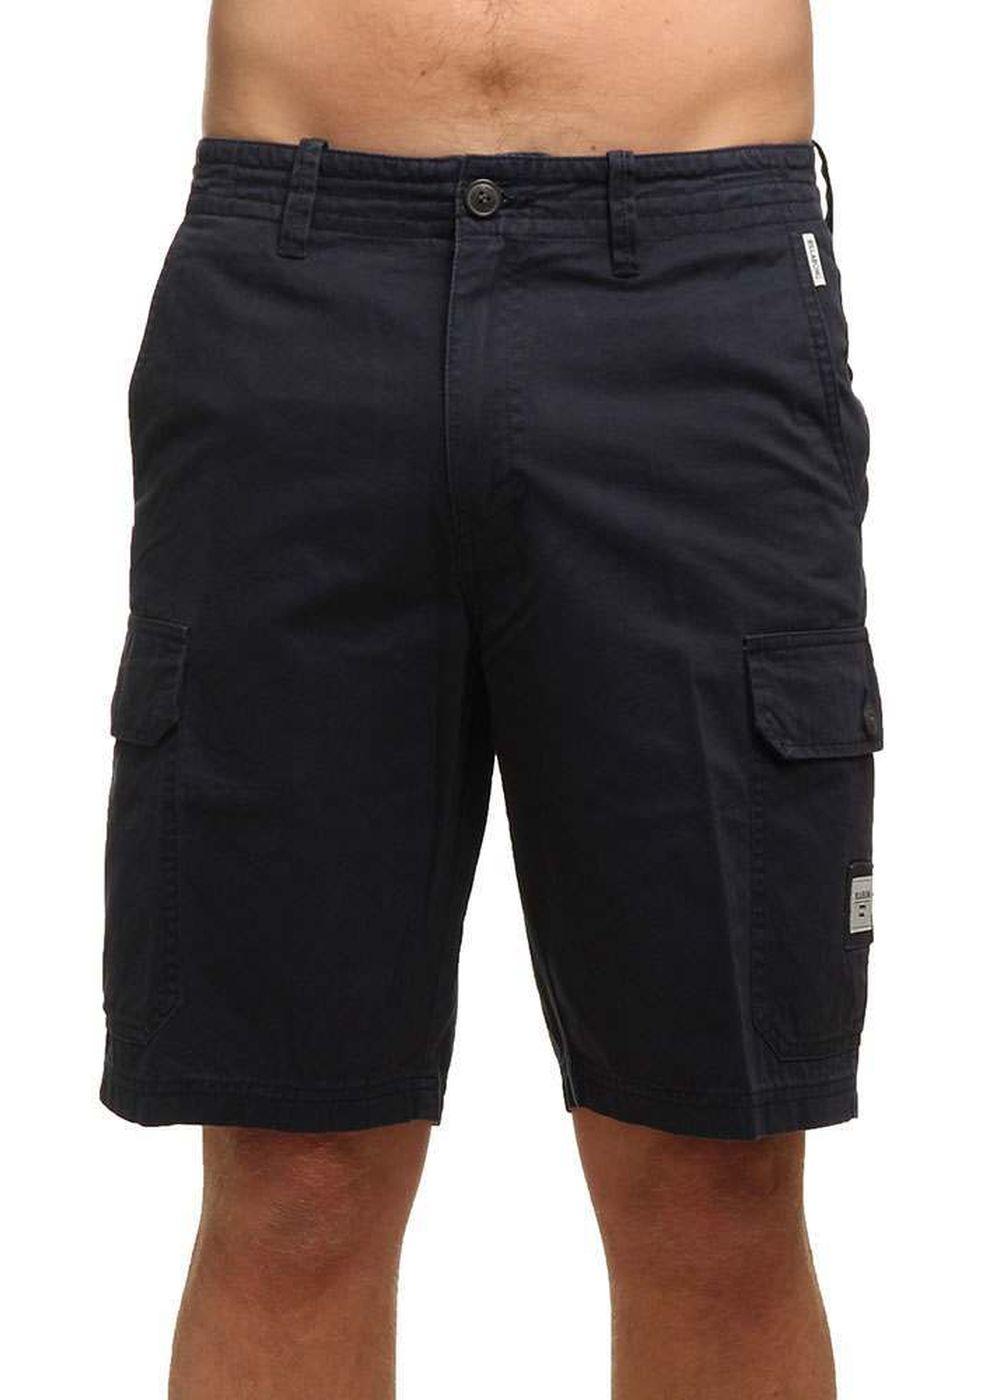 billabong-all-day-cargo-shorts-navy